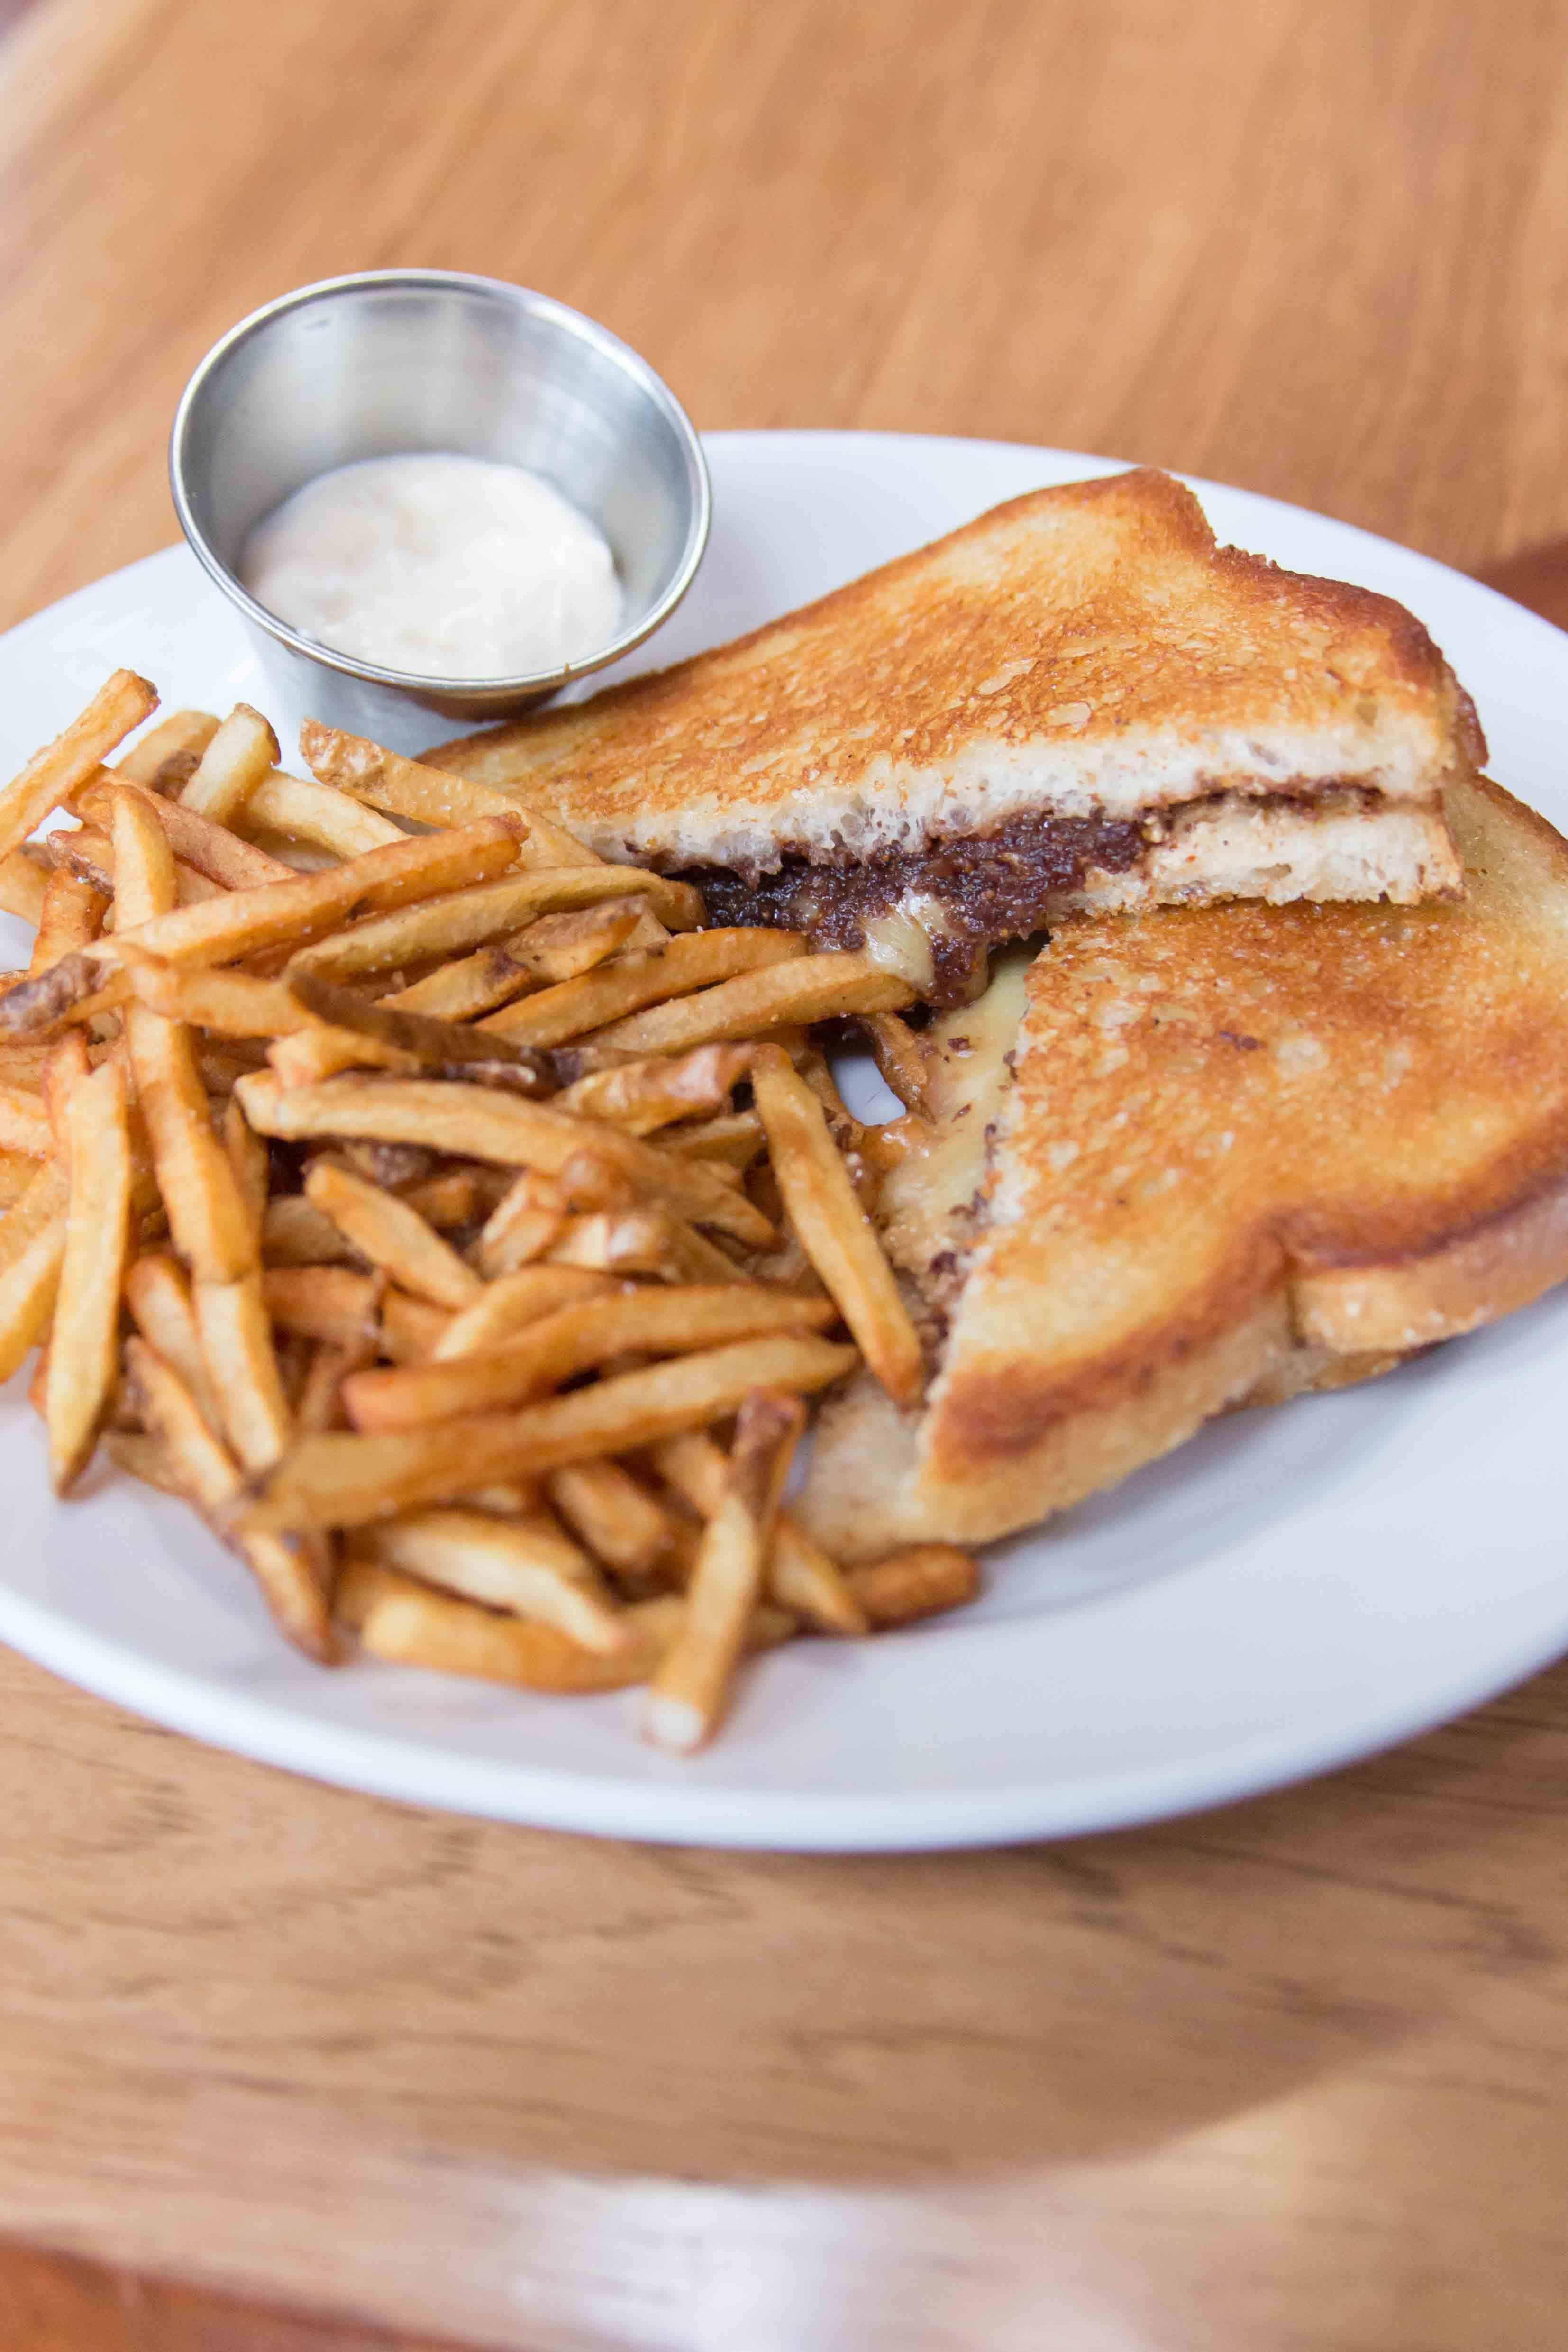 sandwich from Hopleaf